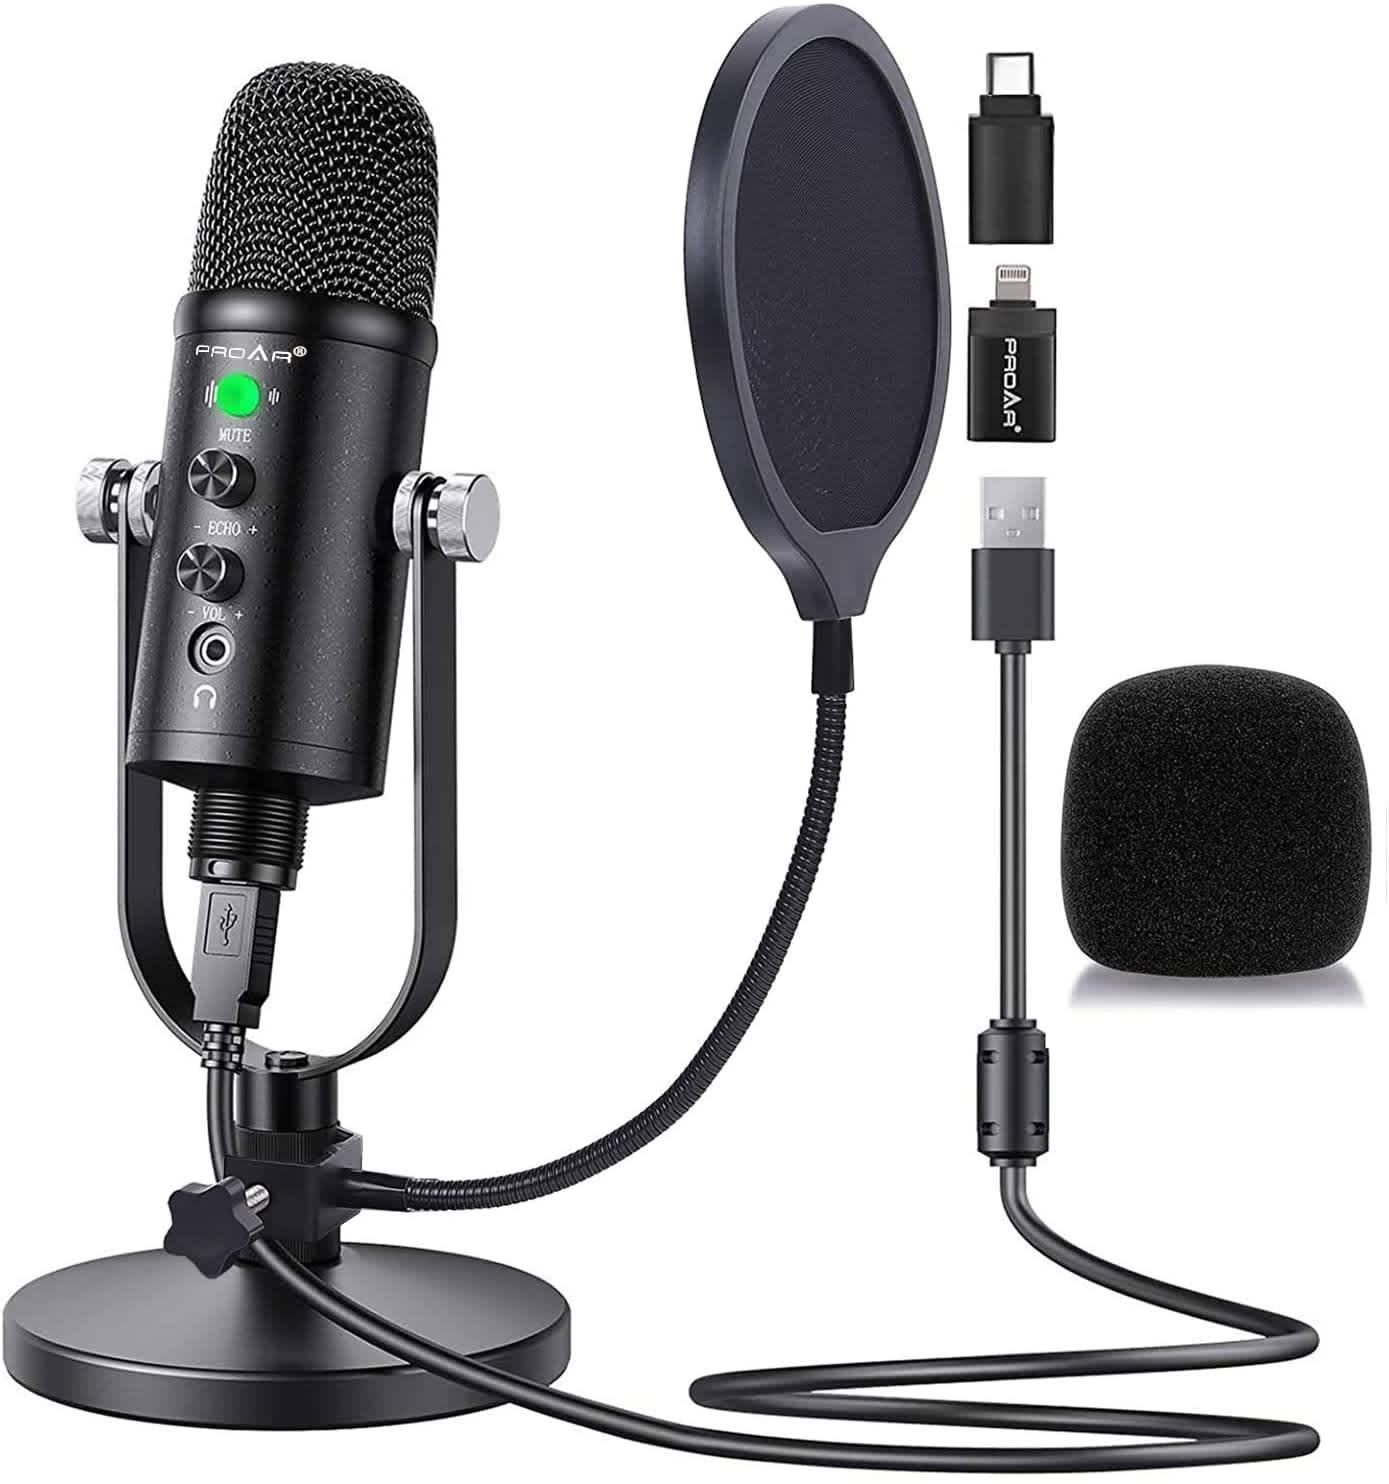 Proar USB Microphone Kit